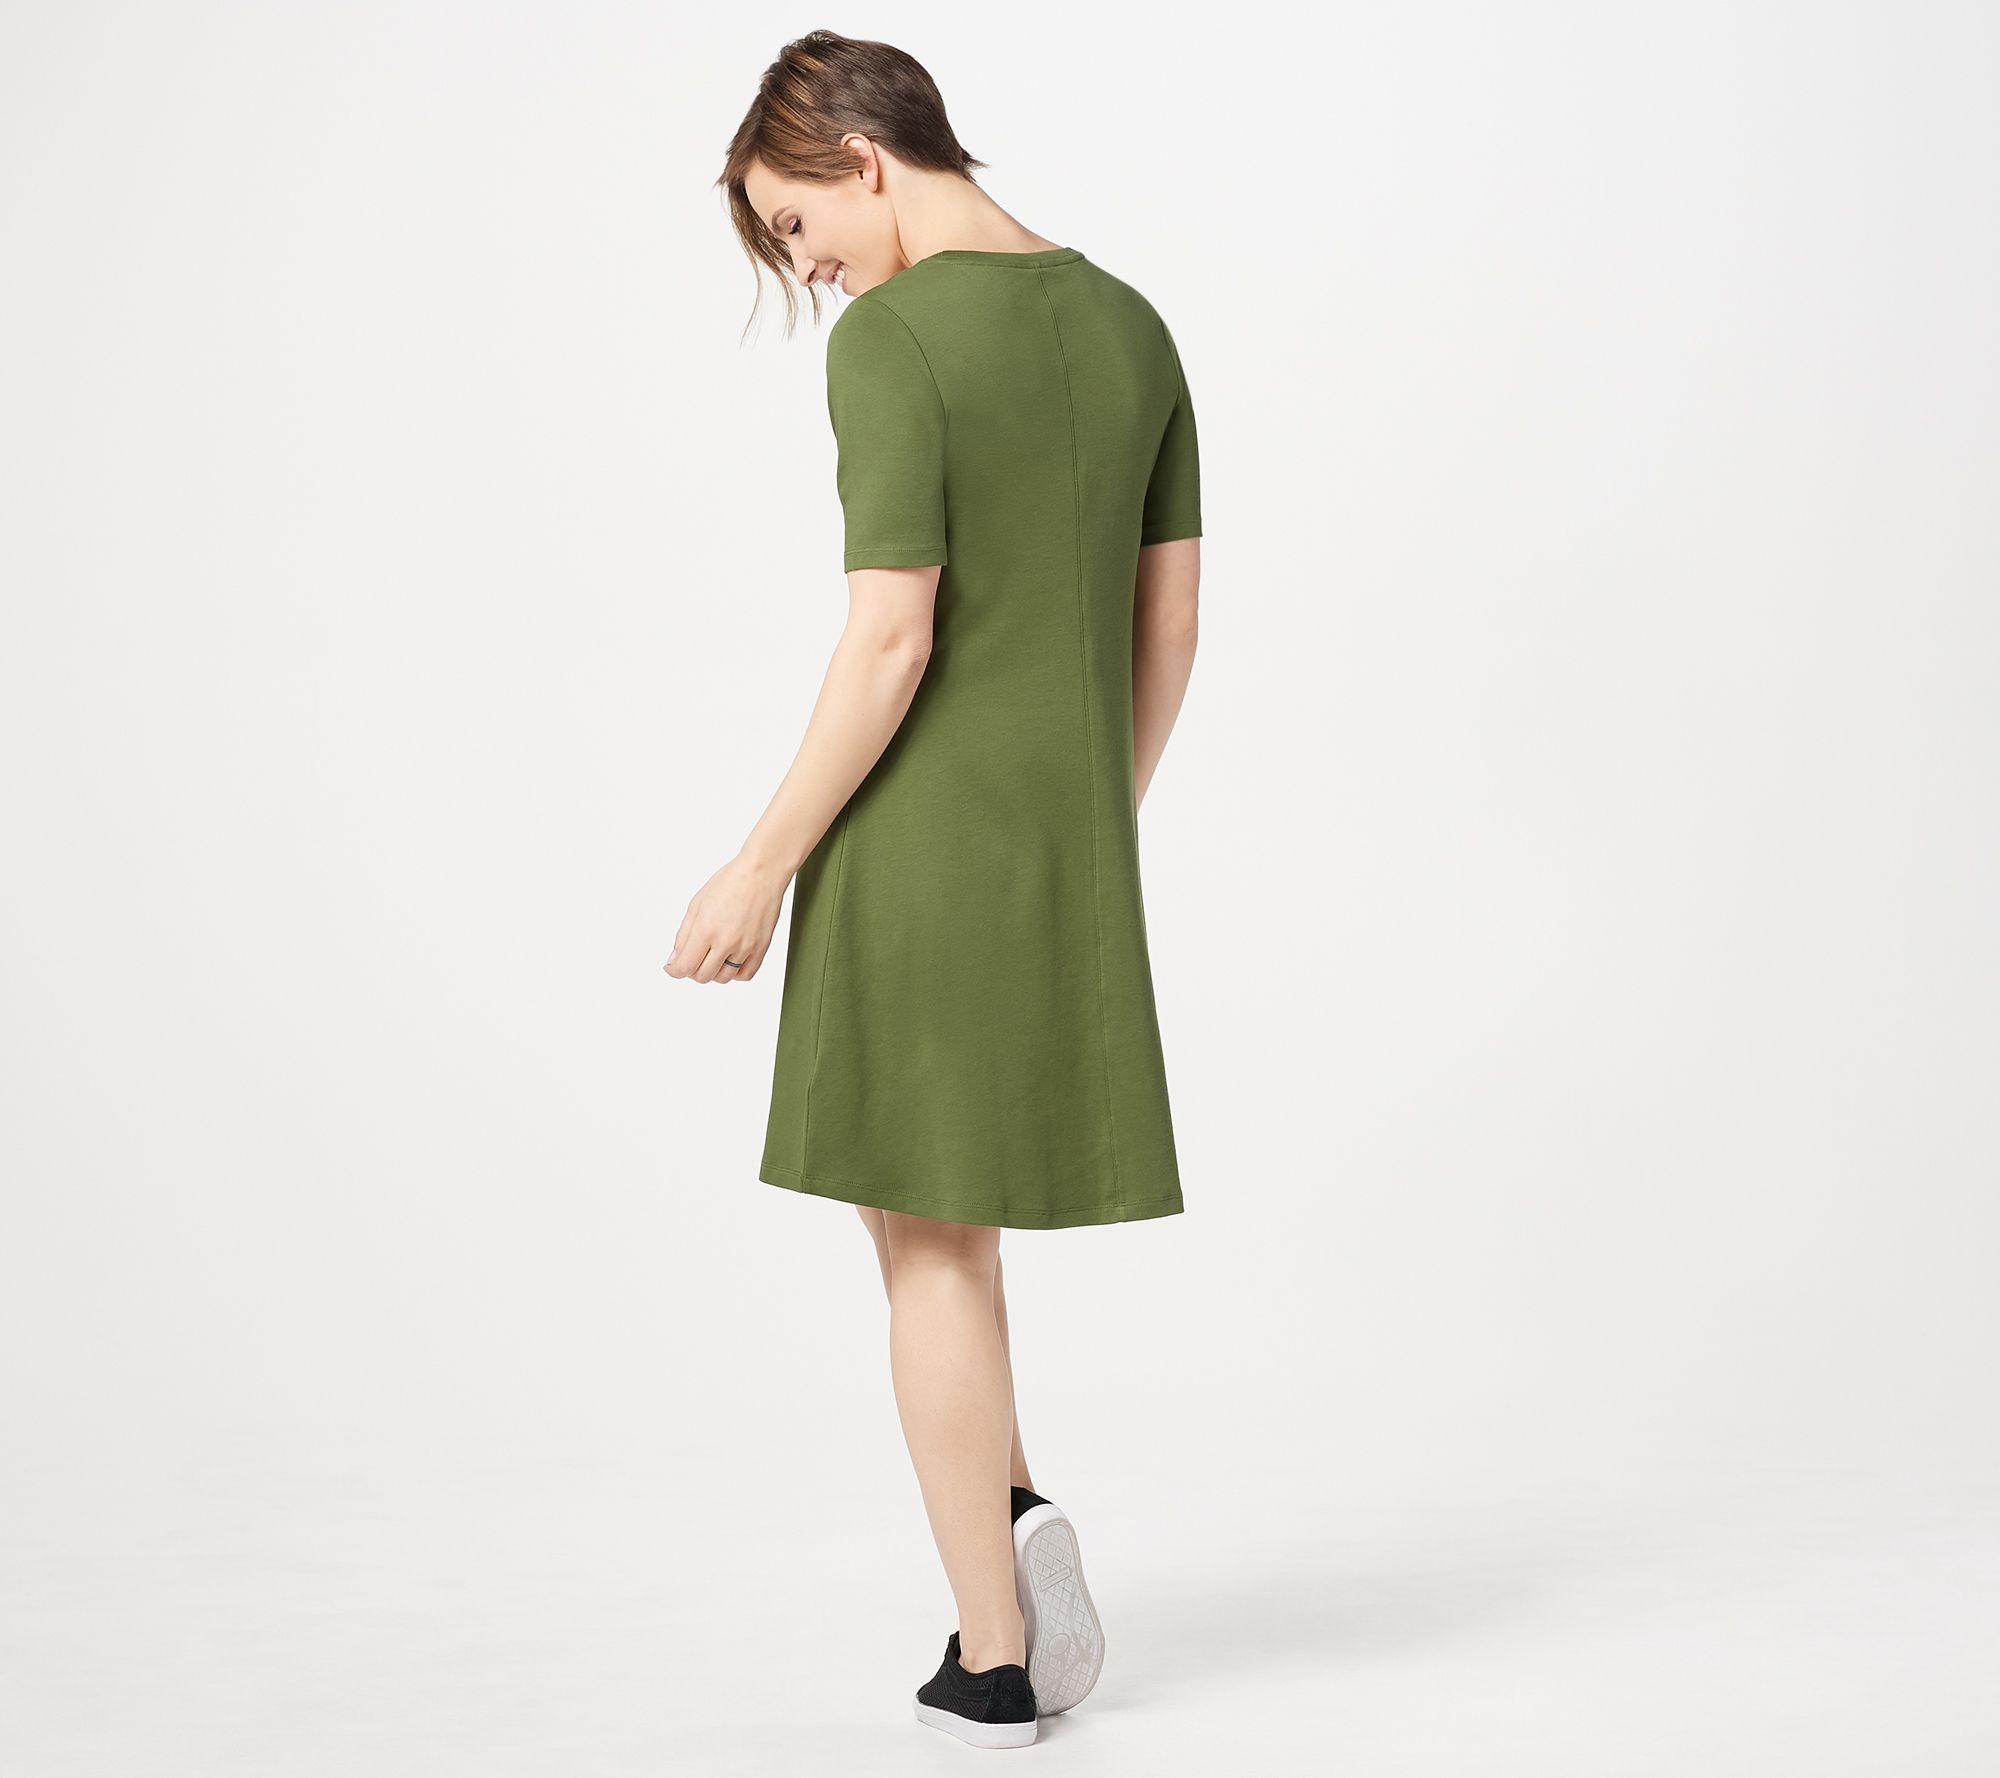 24c44205e5a2 Isaac Mizrahi Live! Regular Essentials Pima Cotton Elbow- Sleeve Dress -  Page 1 — QVC.com